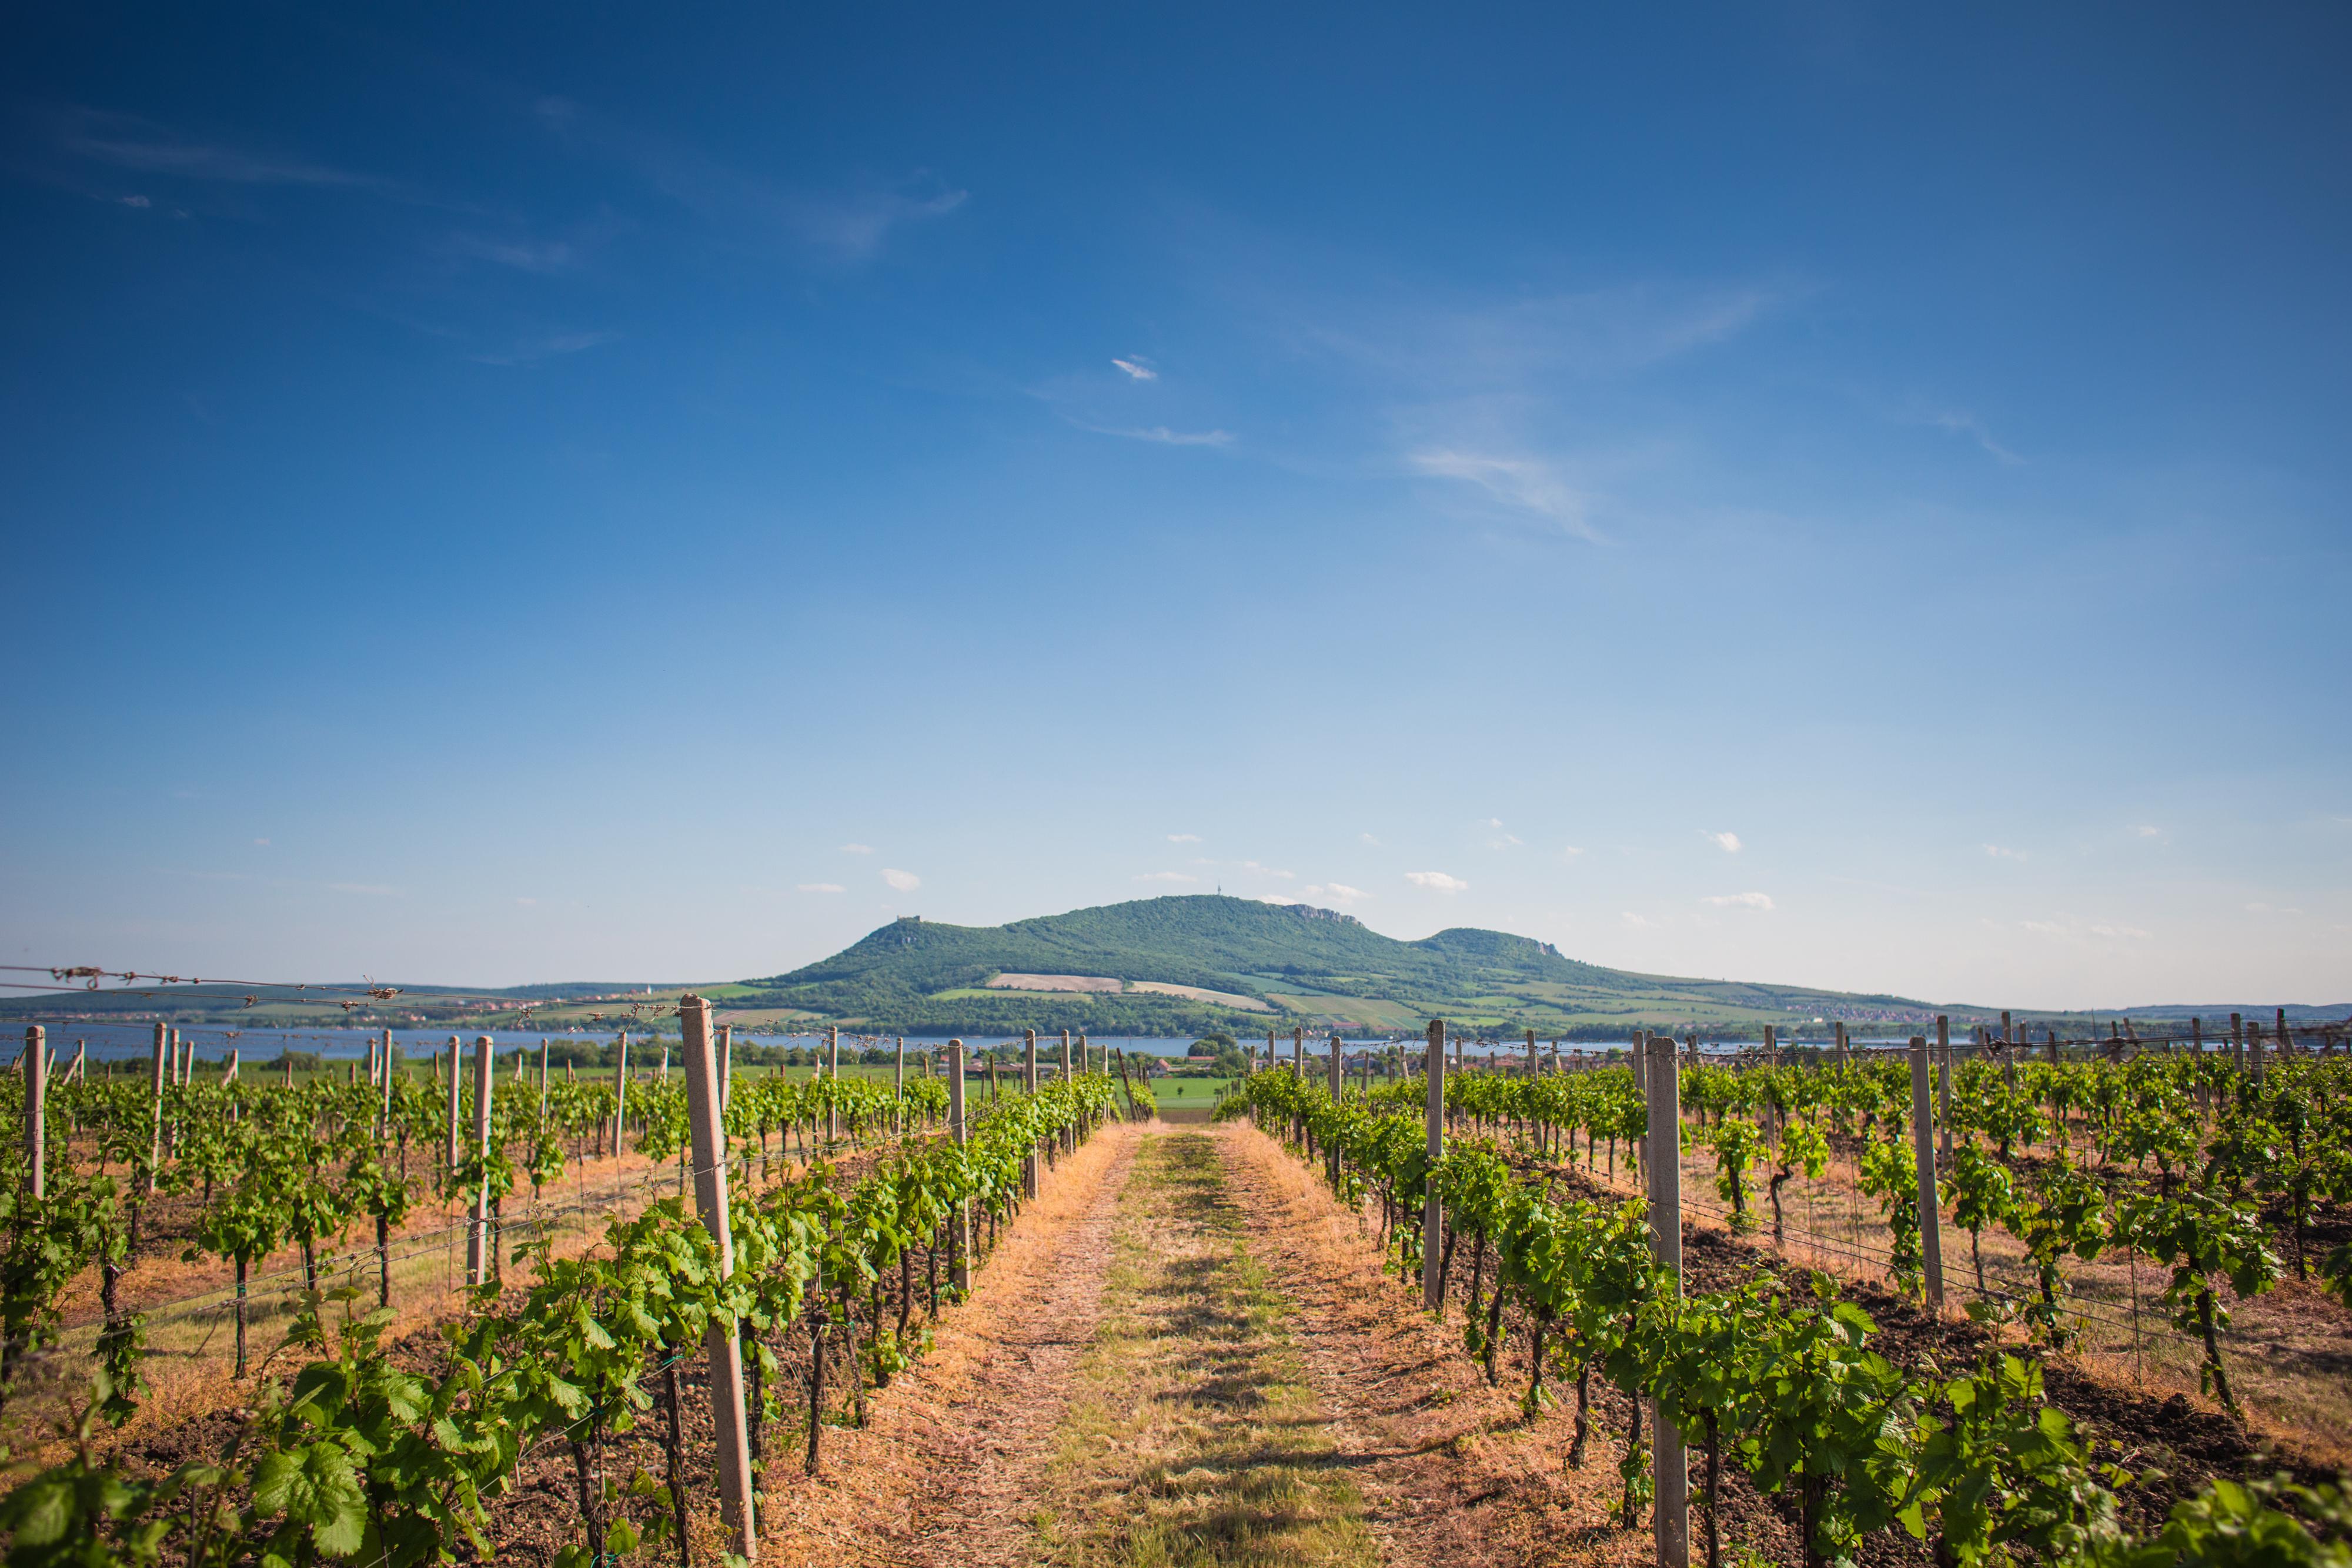 palava-hills-wine-scenery-czech-republic-picjumbo-com